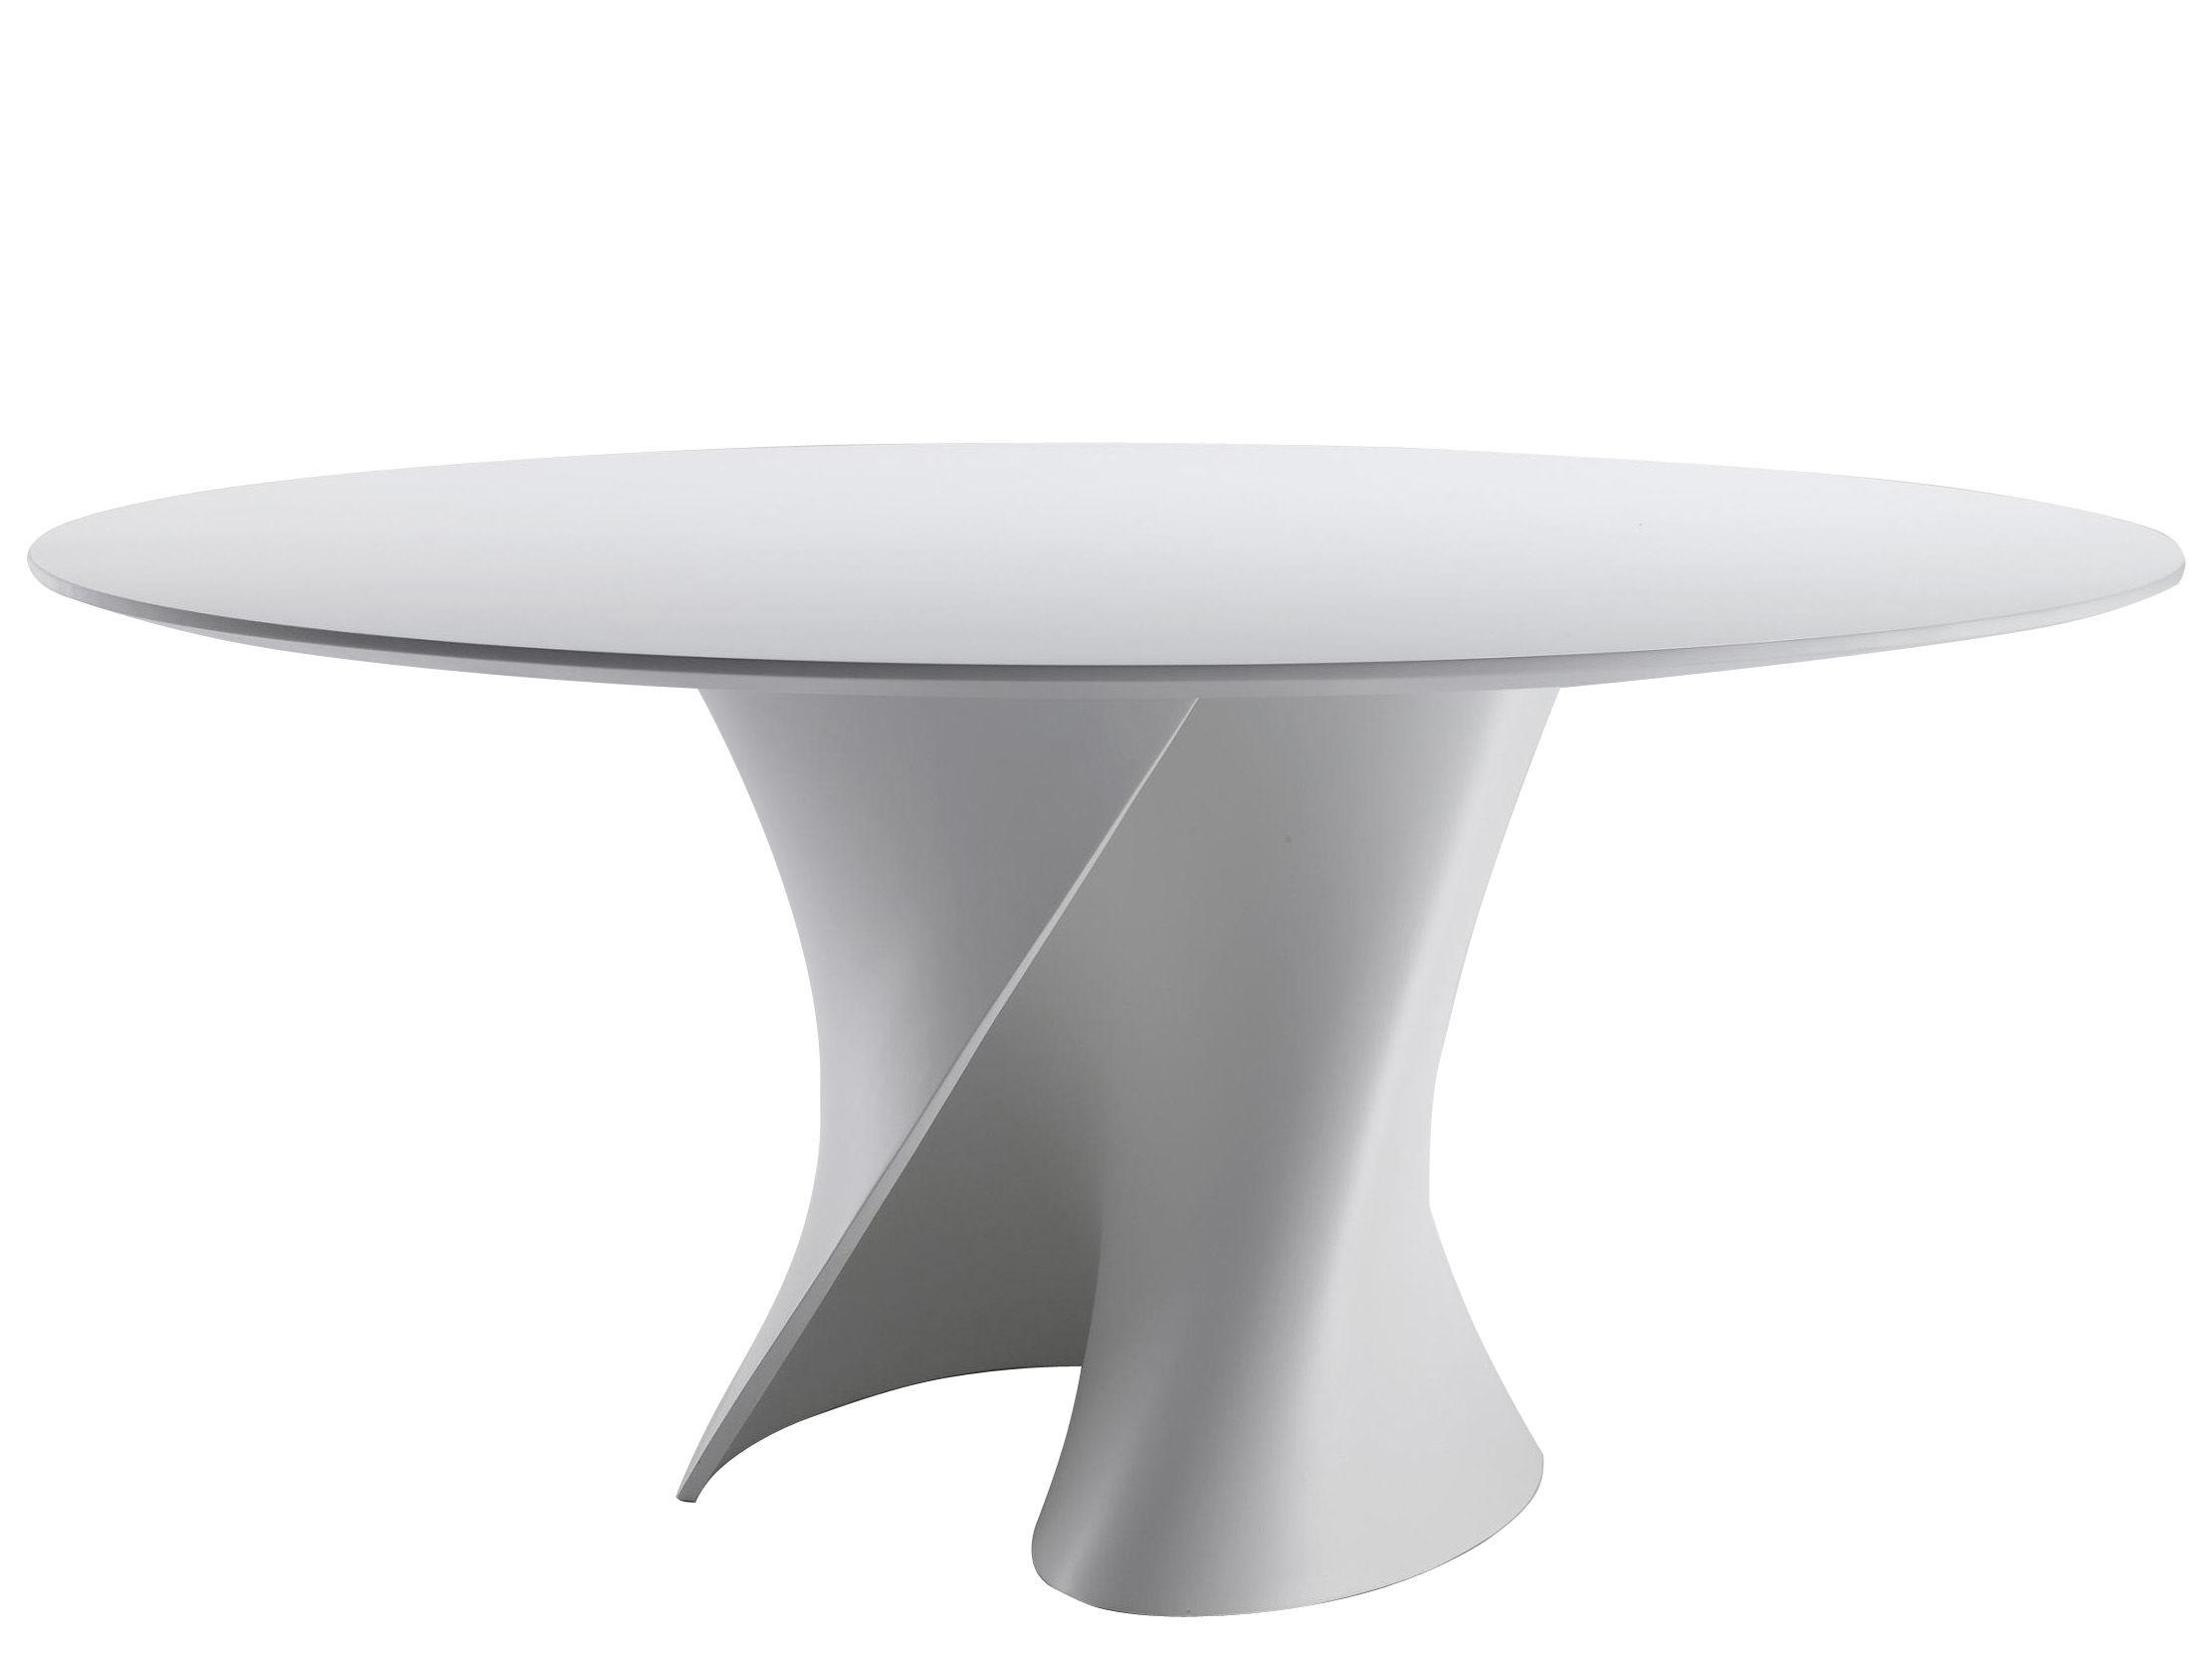 Tendances - À taaable ! - Table ronde S / Ø 140 cm - Plateau Cristalplant - MDF Italia - Blanc - Cristalplant